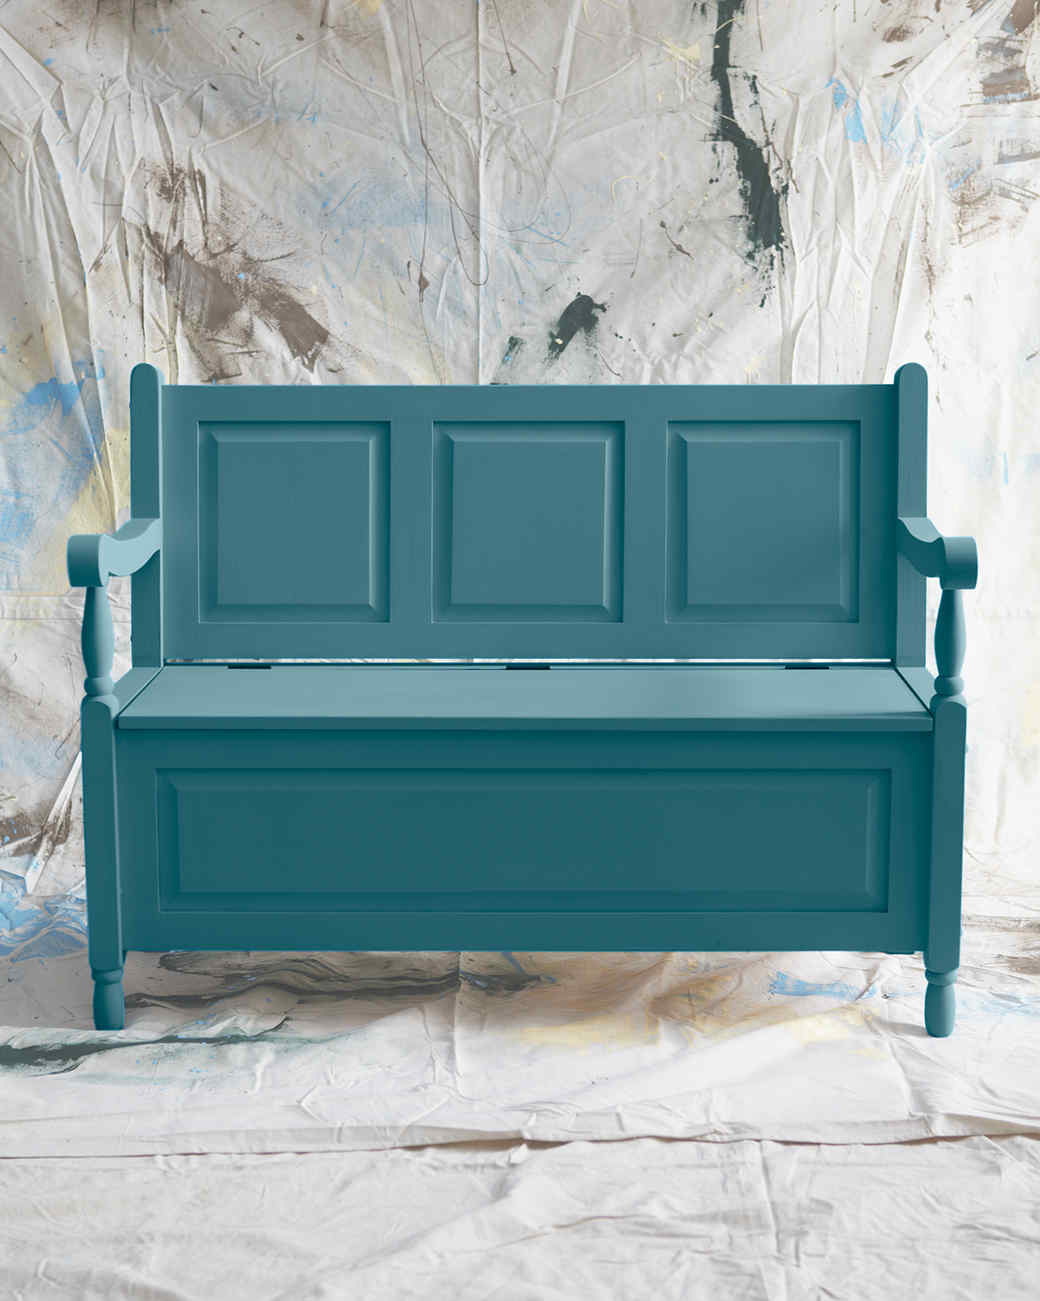 bench-finishing-touches-01-d106594-0815.jpg